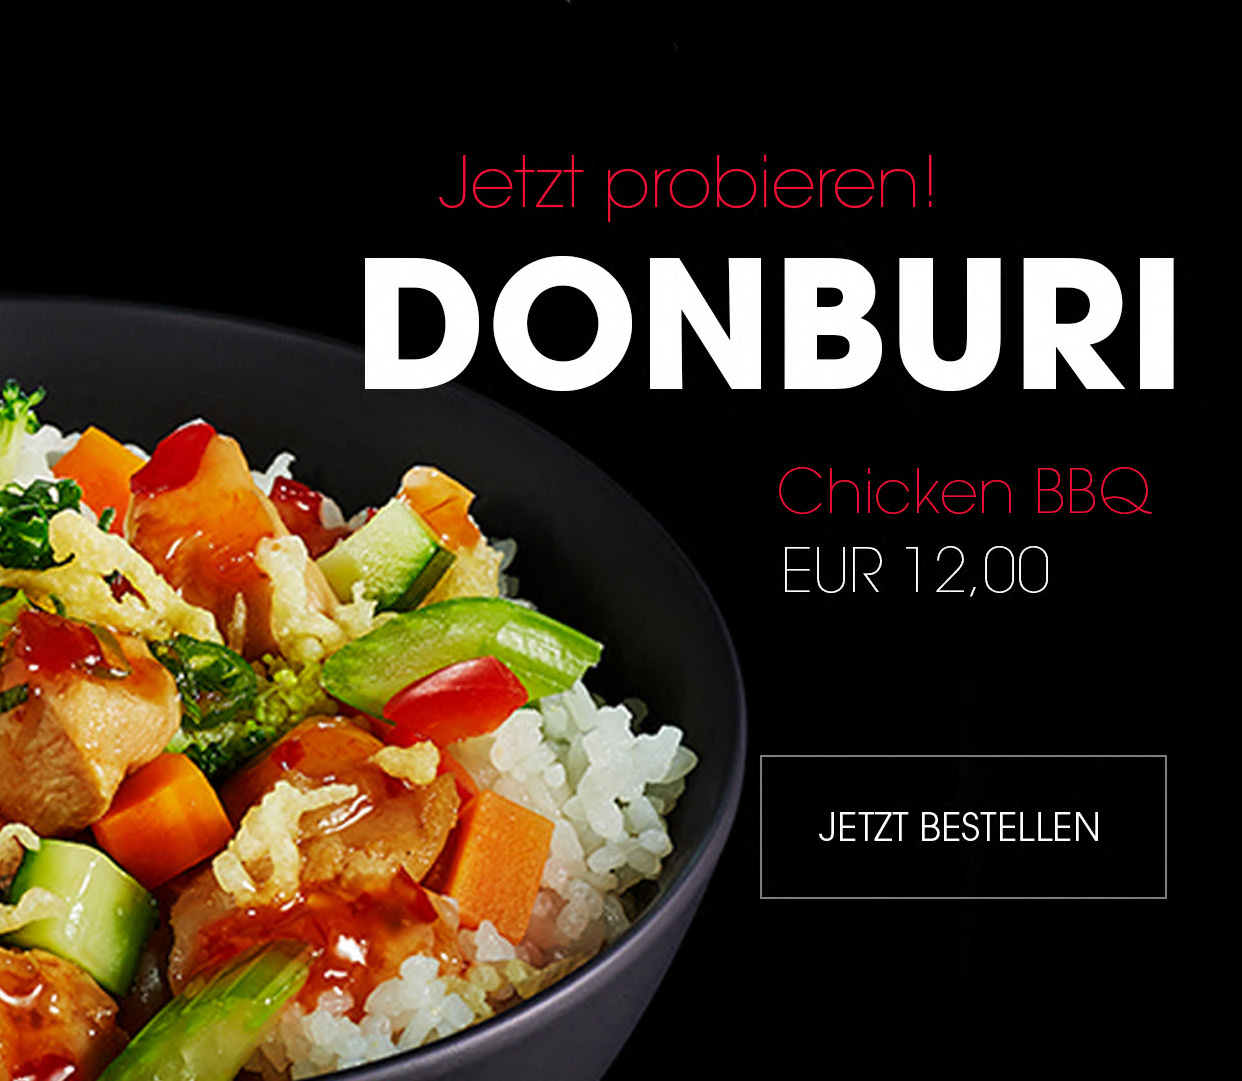 shizoo. Sushi Lieferservice München Donburi